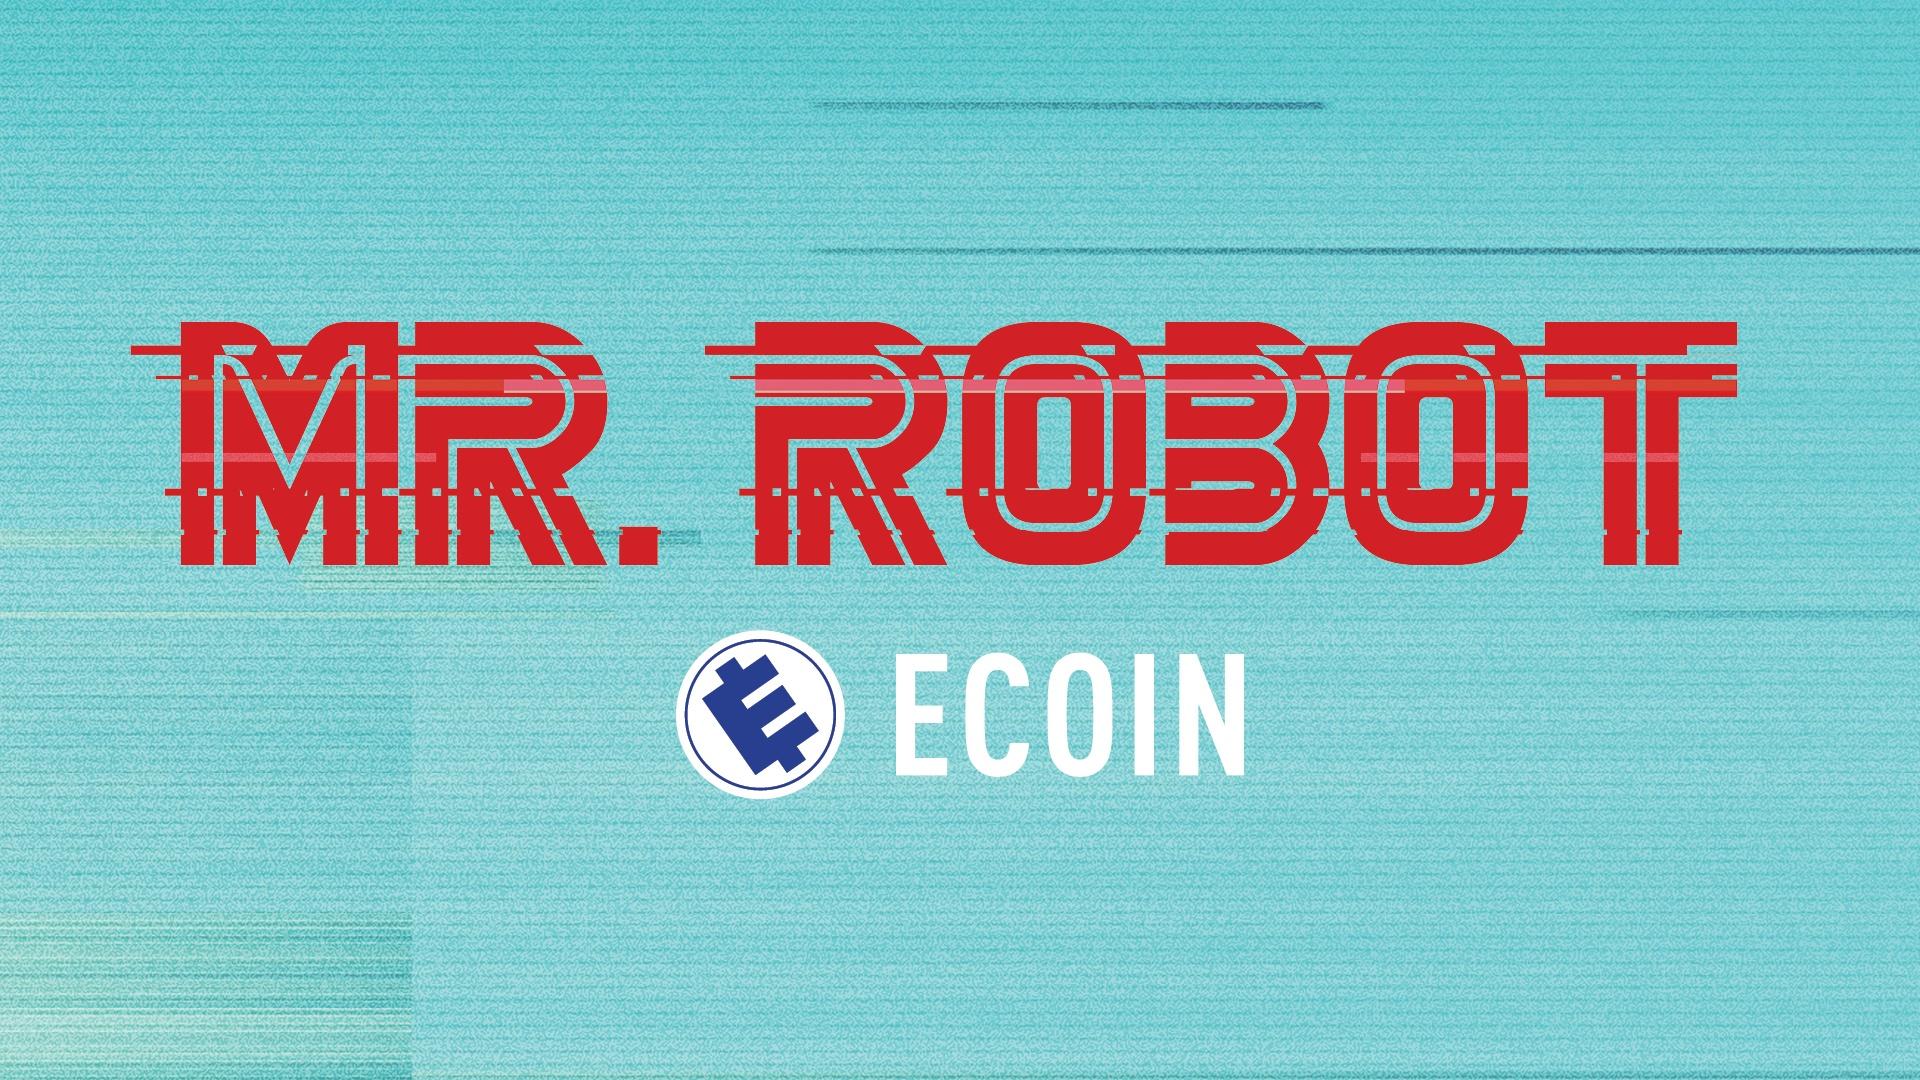 Thumbnail for Mr. Robot: Ecoin